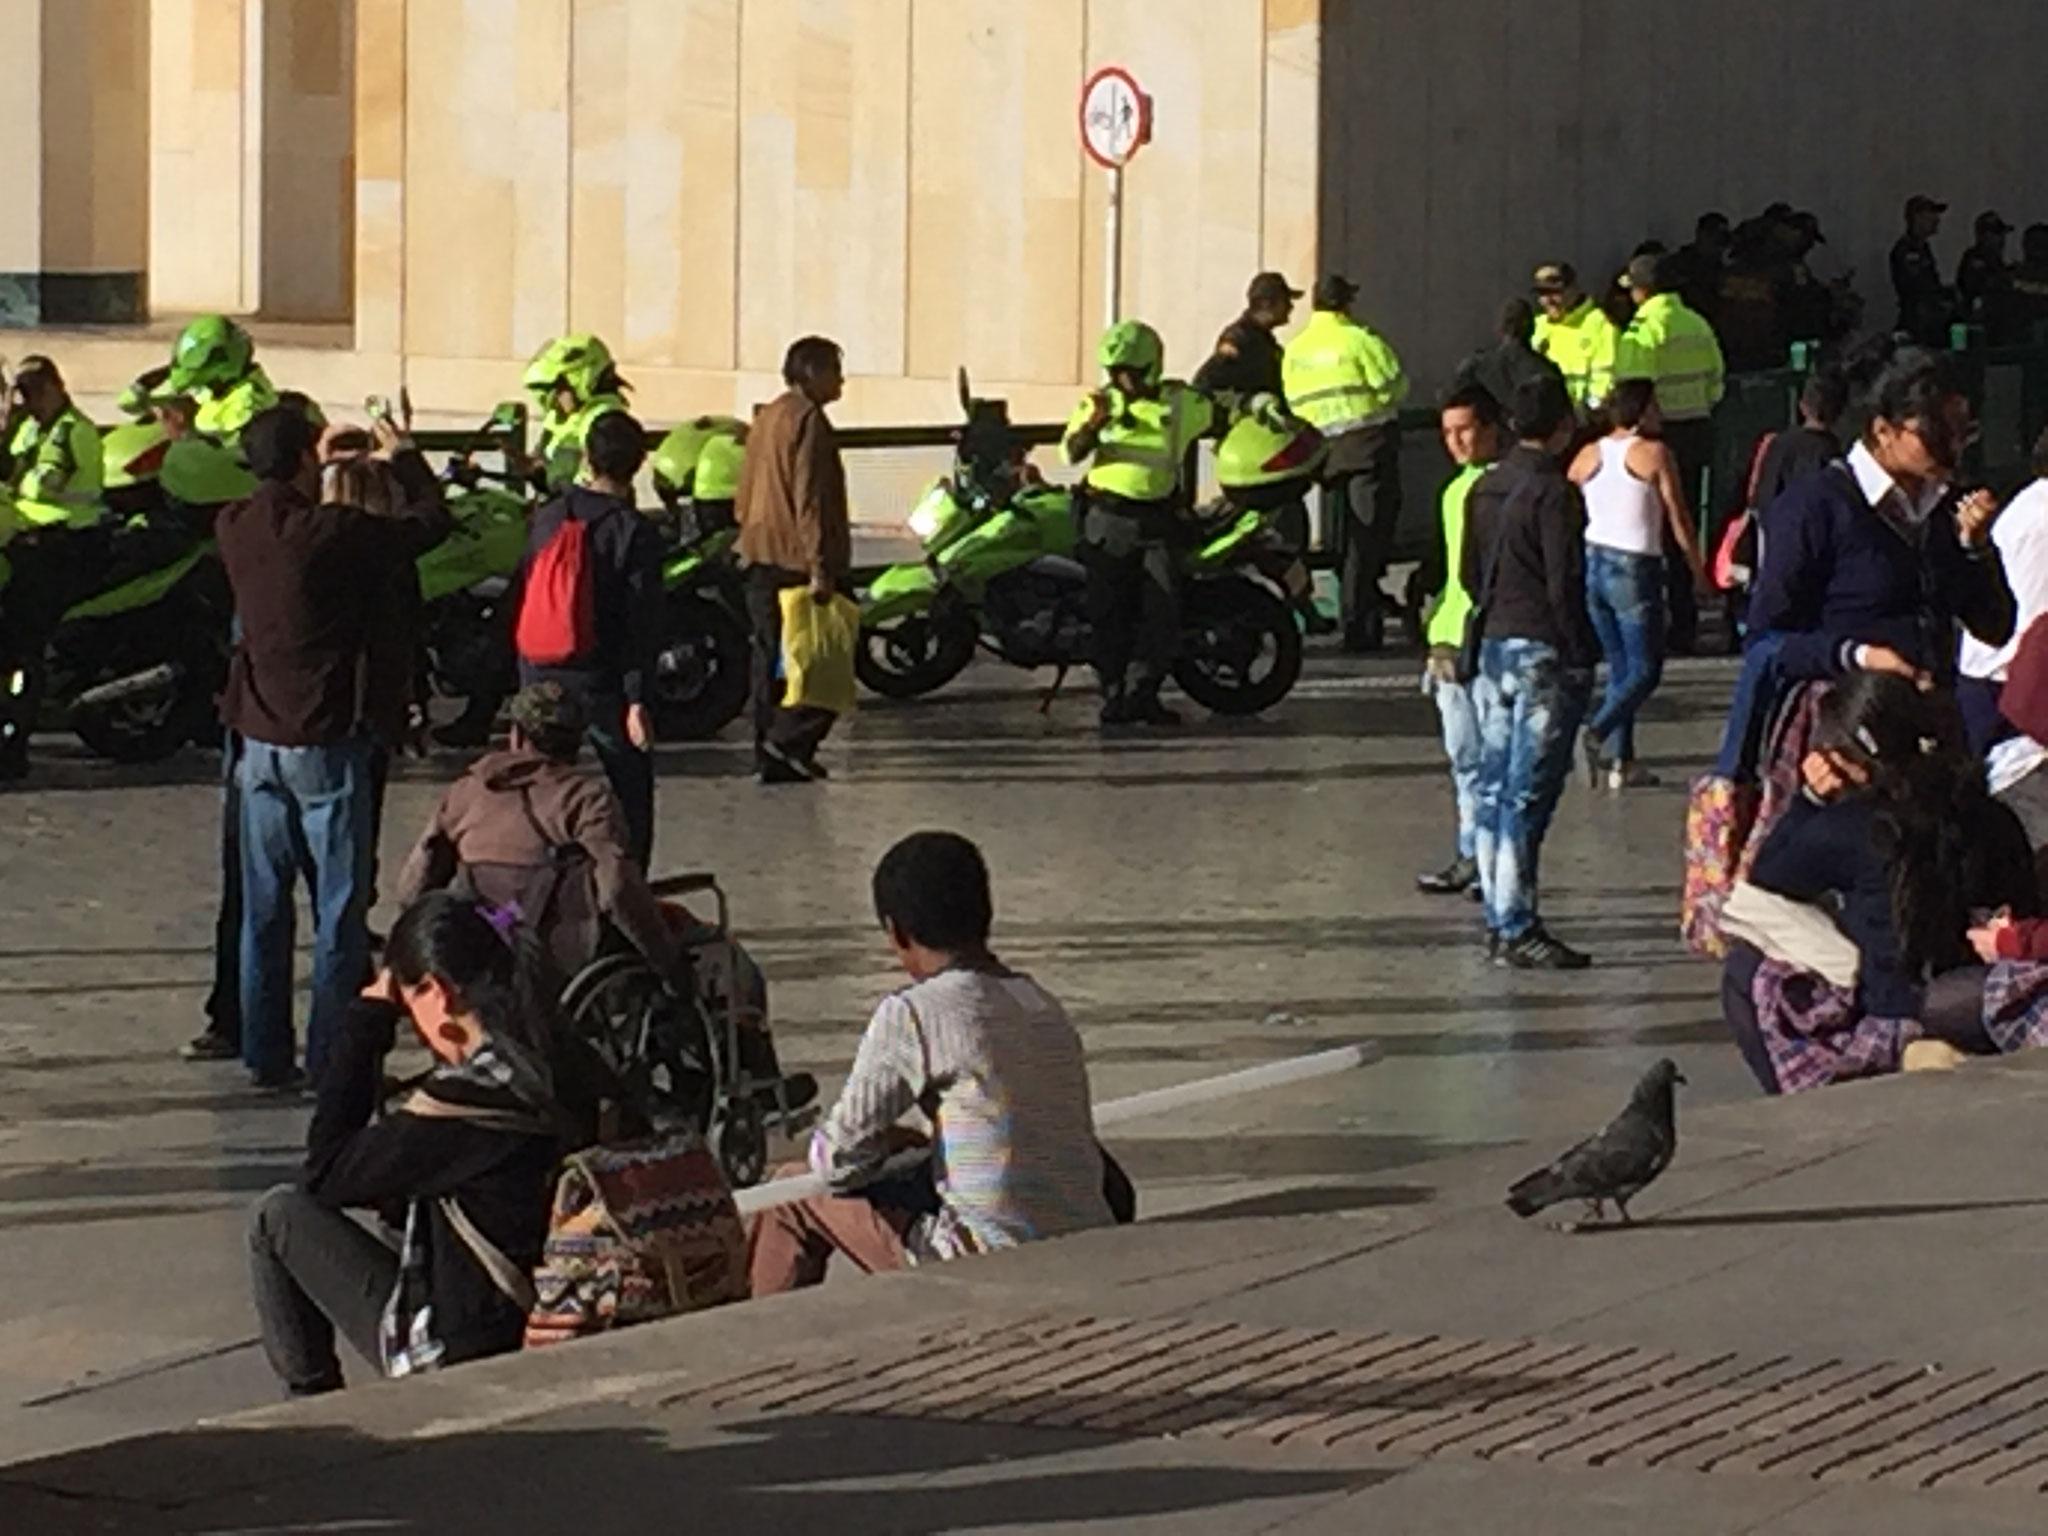 Polizeiaufgebot am Plaza de Bolivar